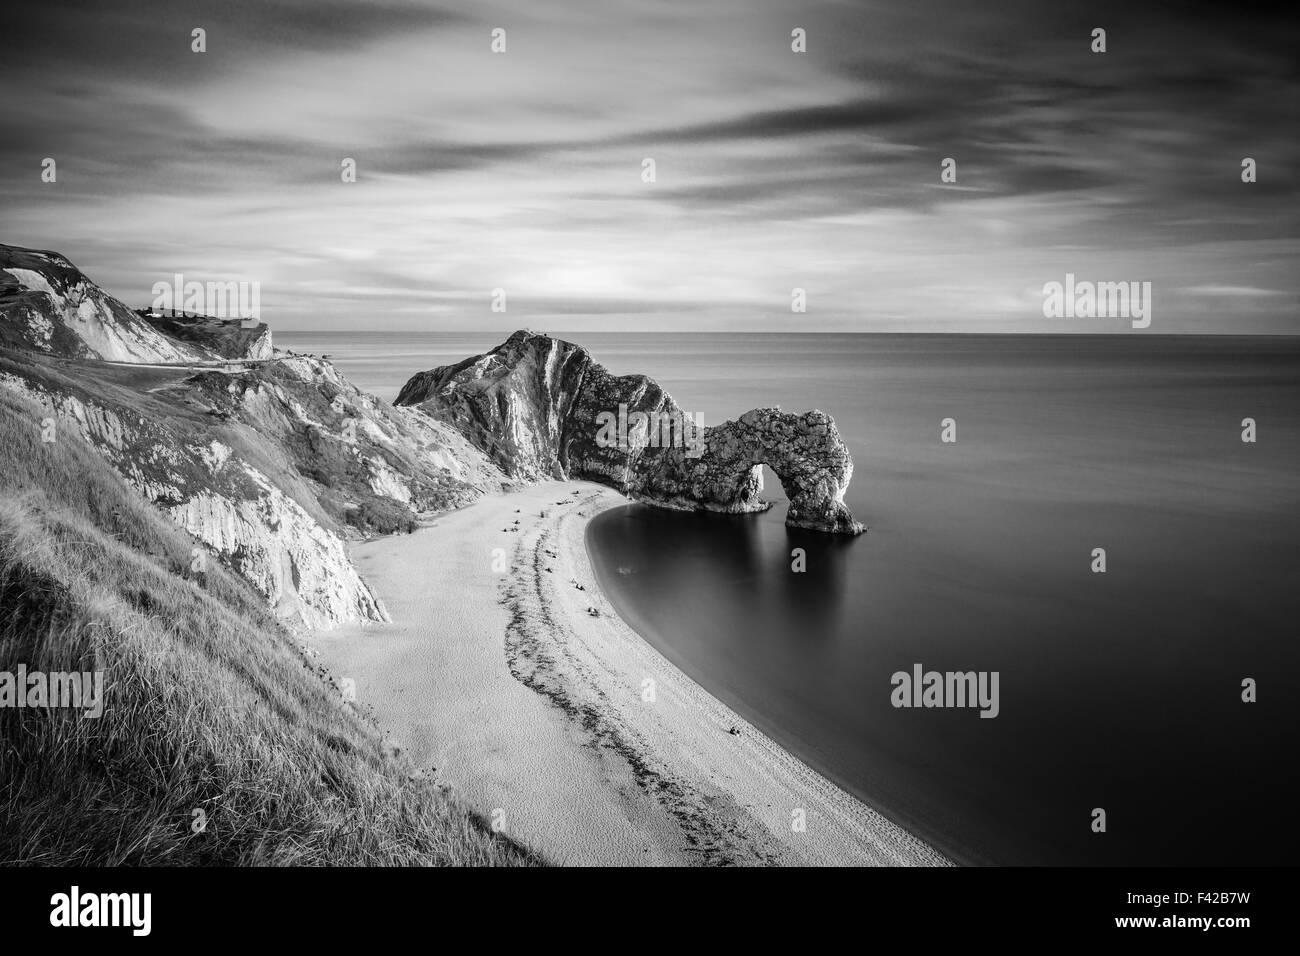 Durdle Door, Jurassic Coast, UNESCO Website, Dorset, England, UK Stockbild